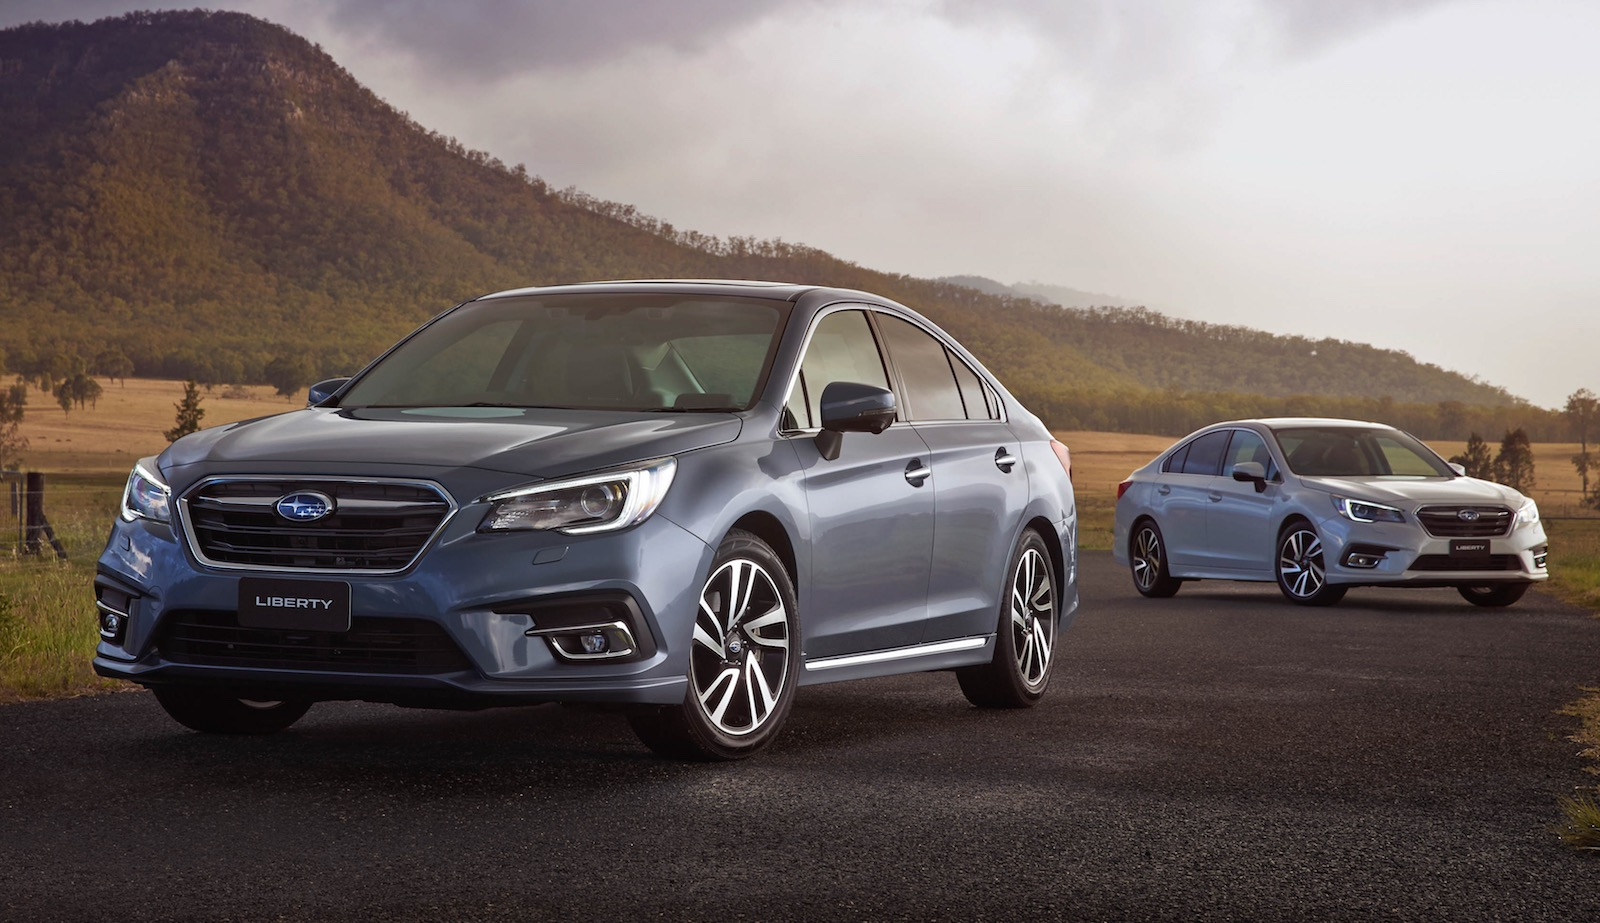 Subaru Liberty Being Killed Off In Australia No New Model Coming Performancedrive